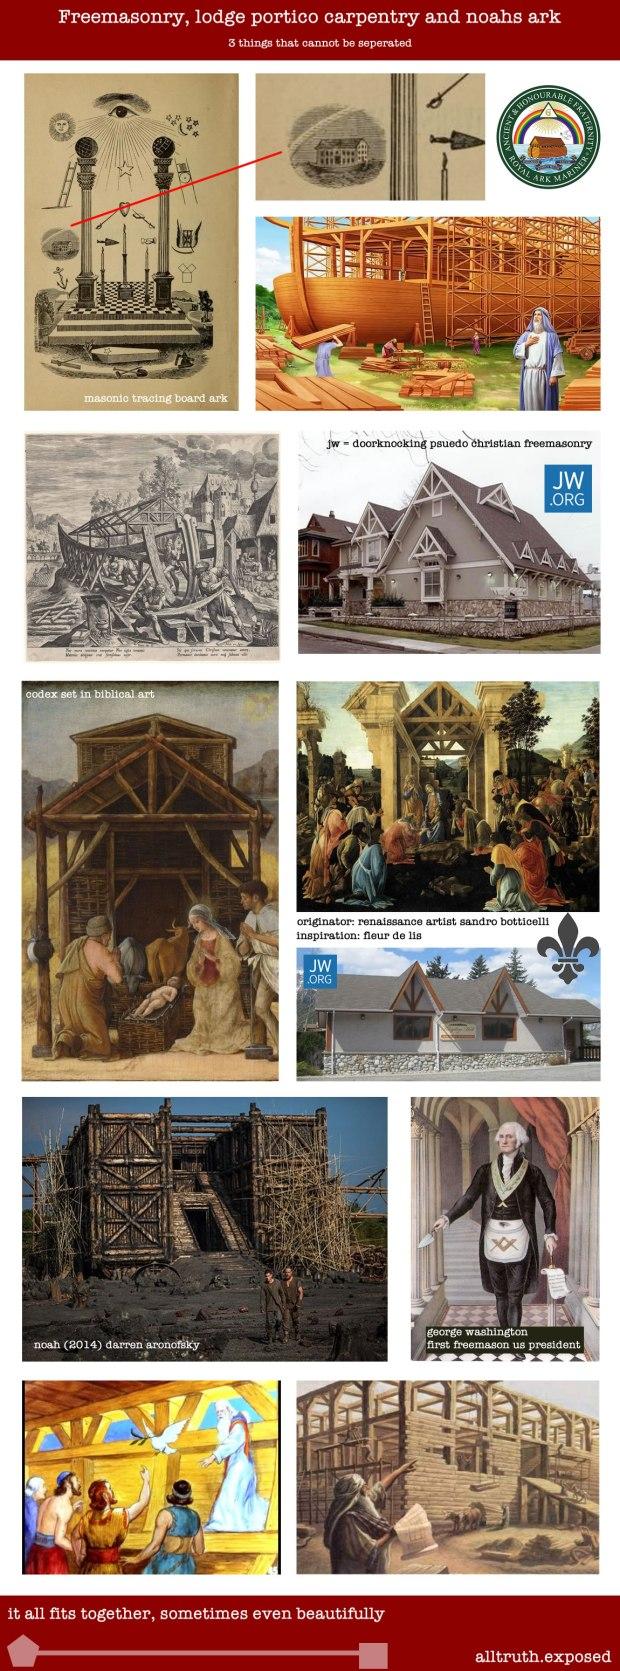 freemasonry portico lodge noah ark